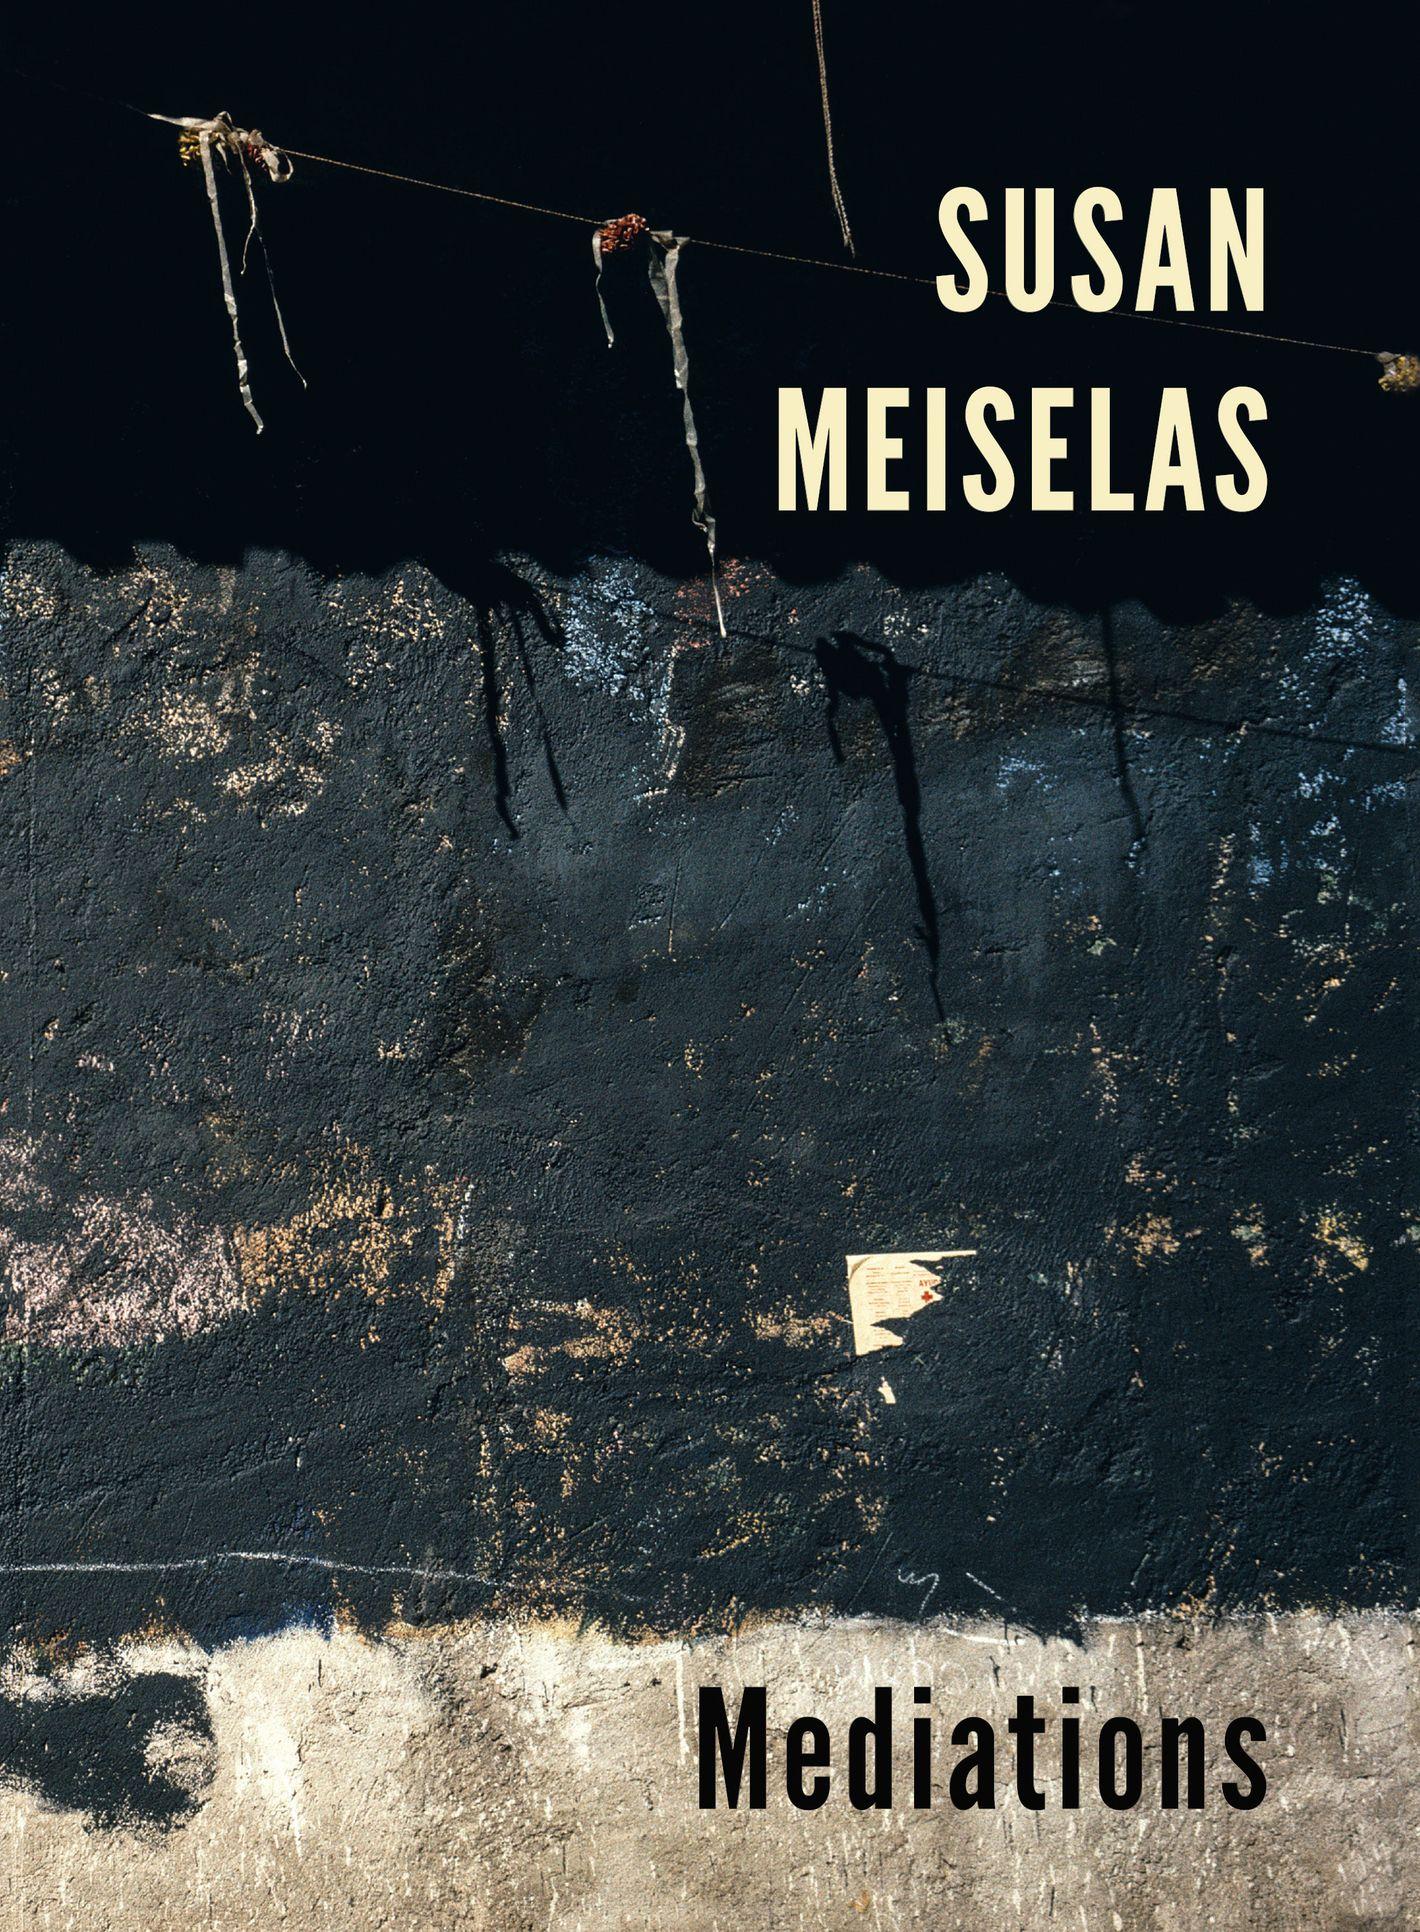 Susan Meiselas: Meditations